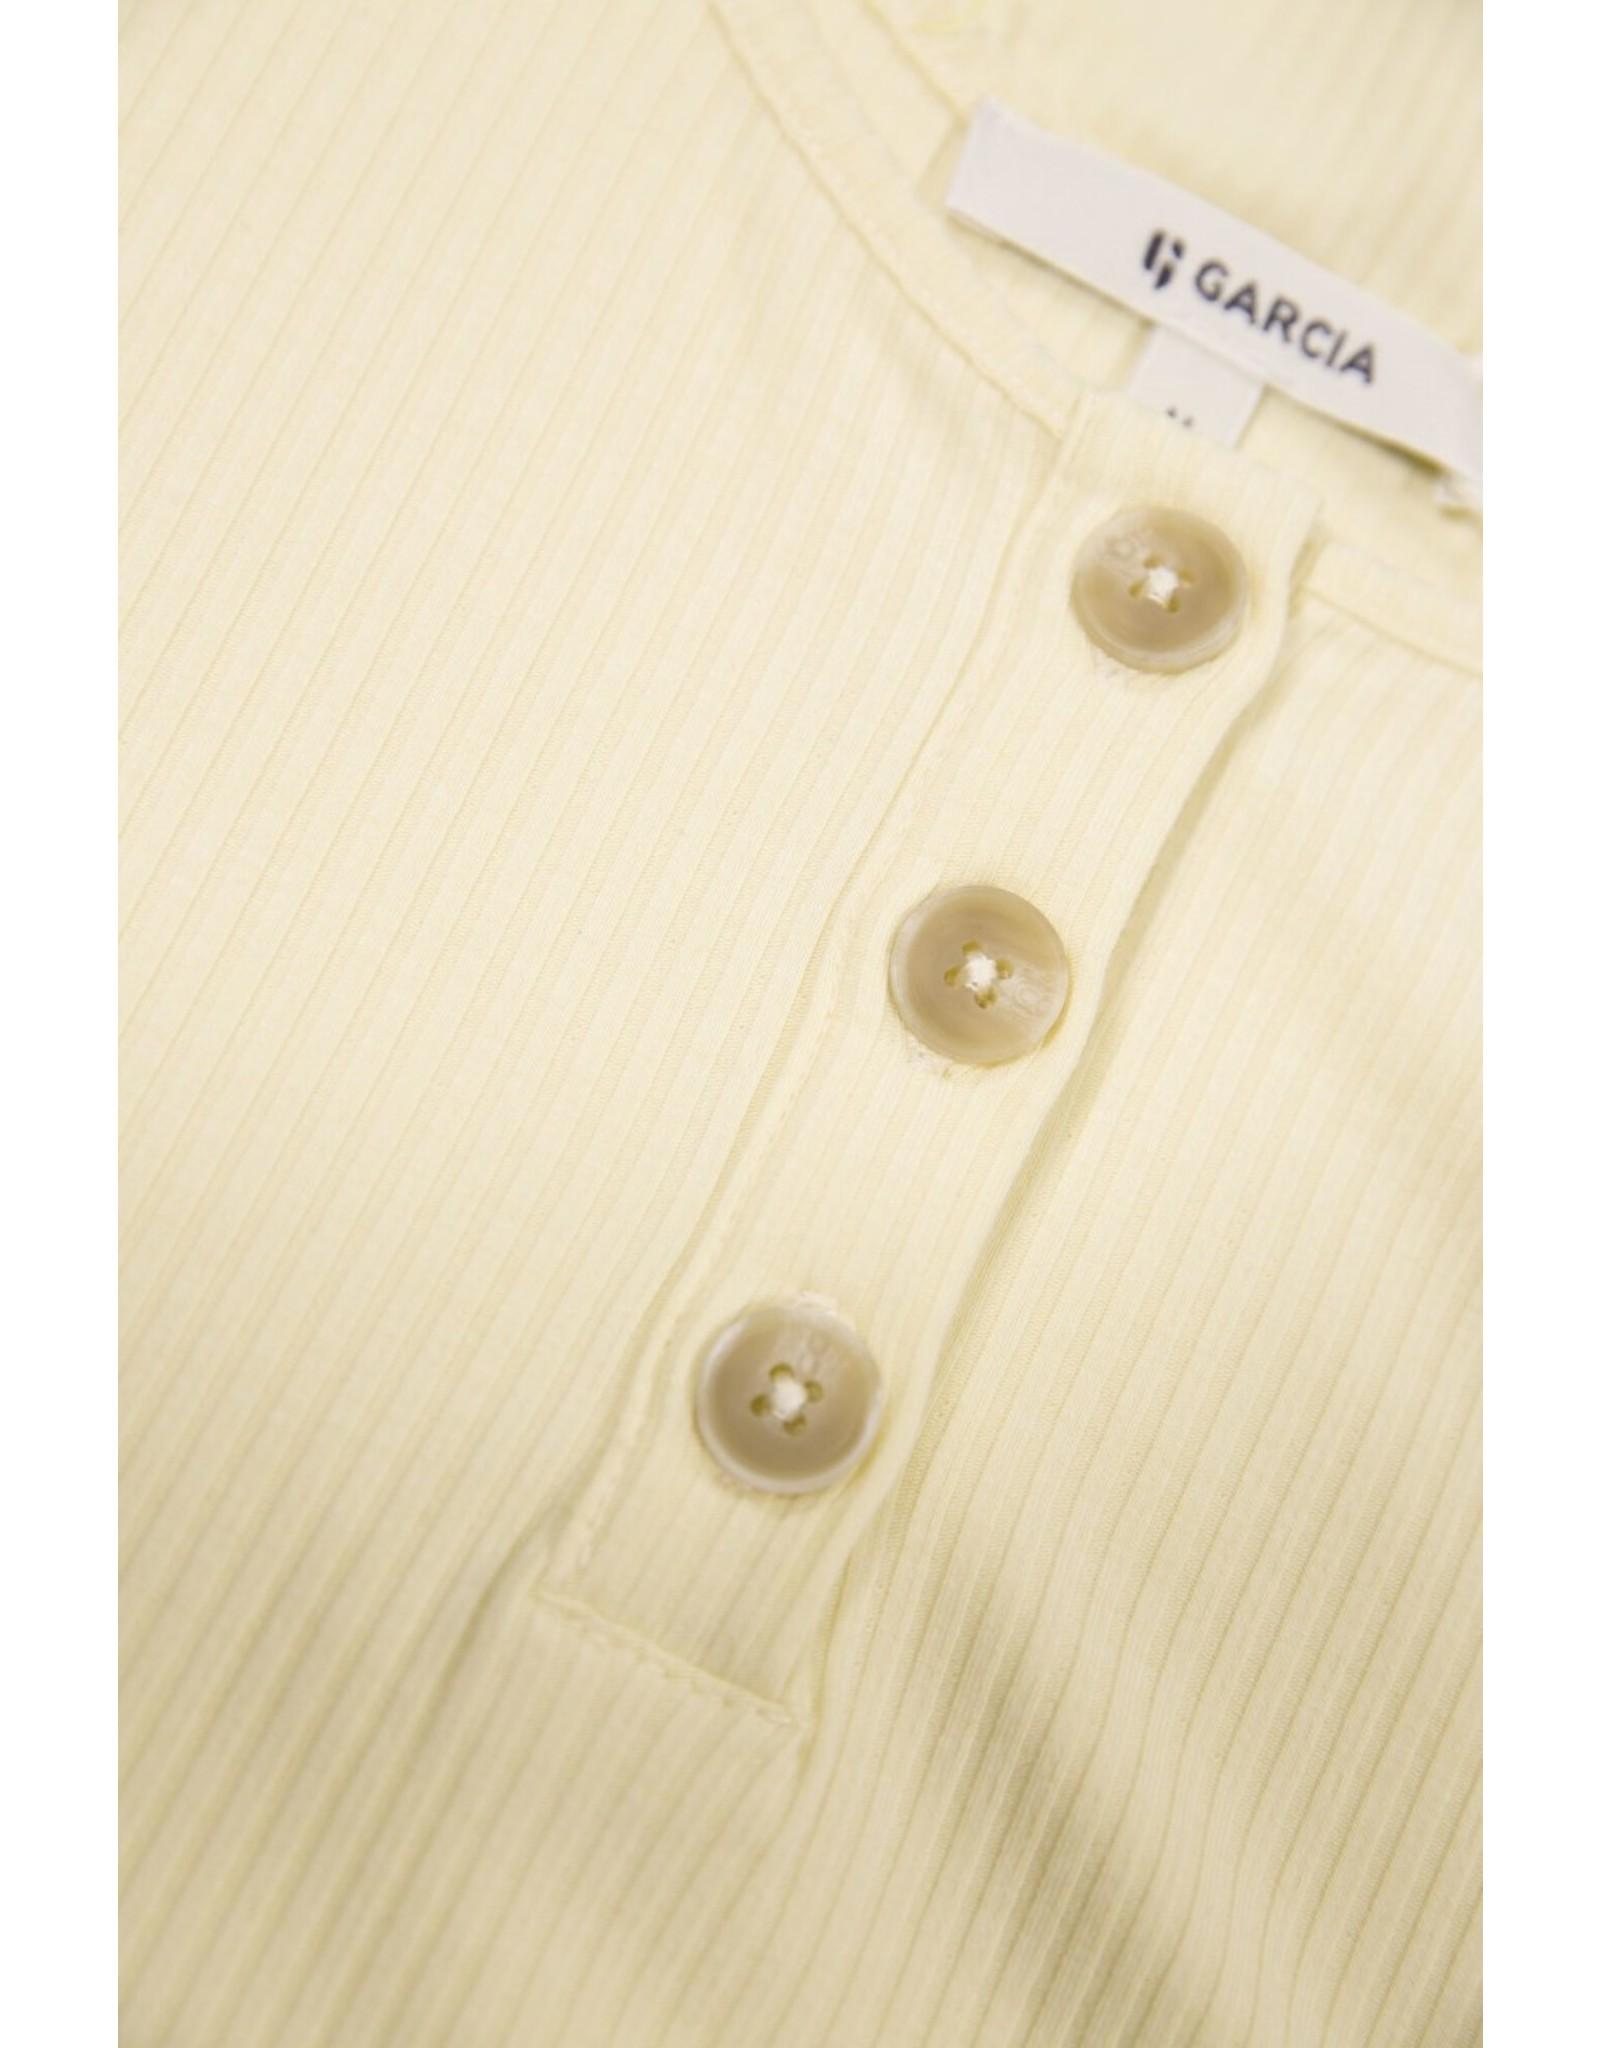 GARCIA GARCIA-CAMISOLE-E1021253